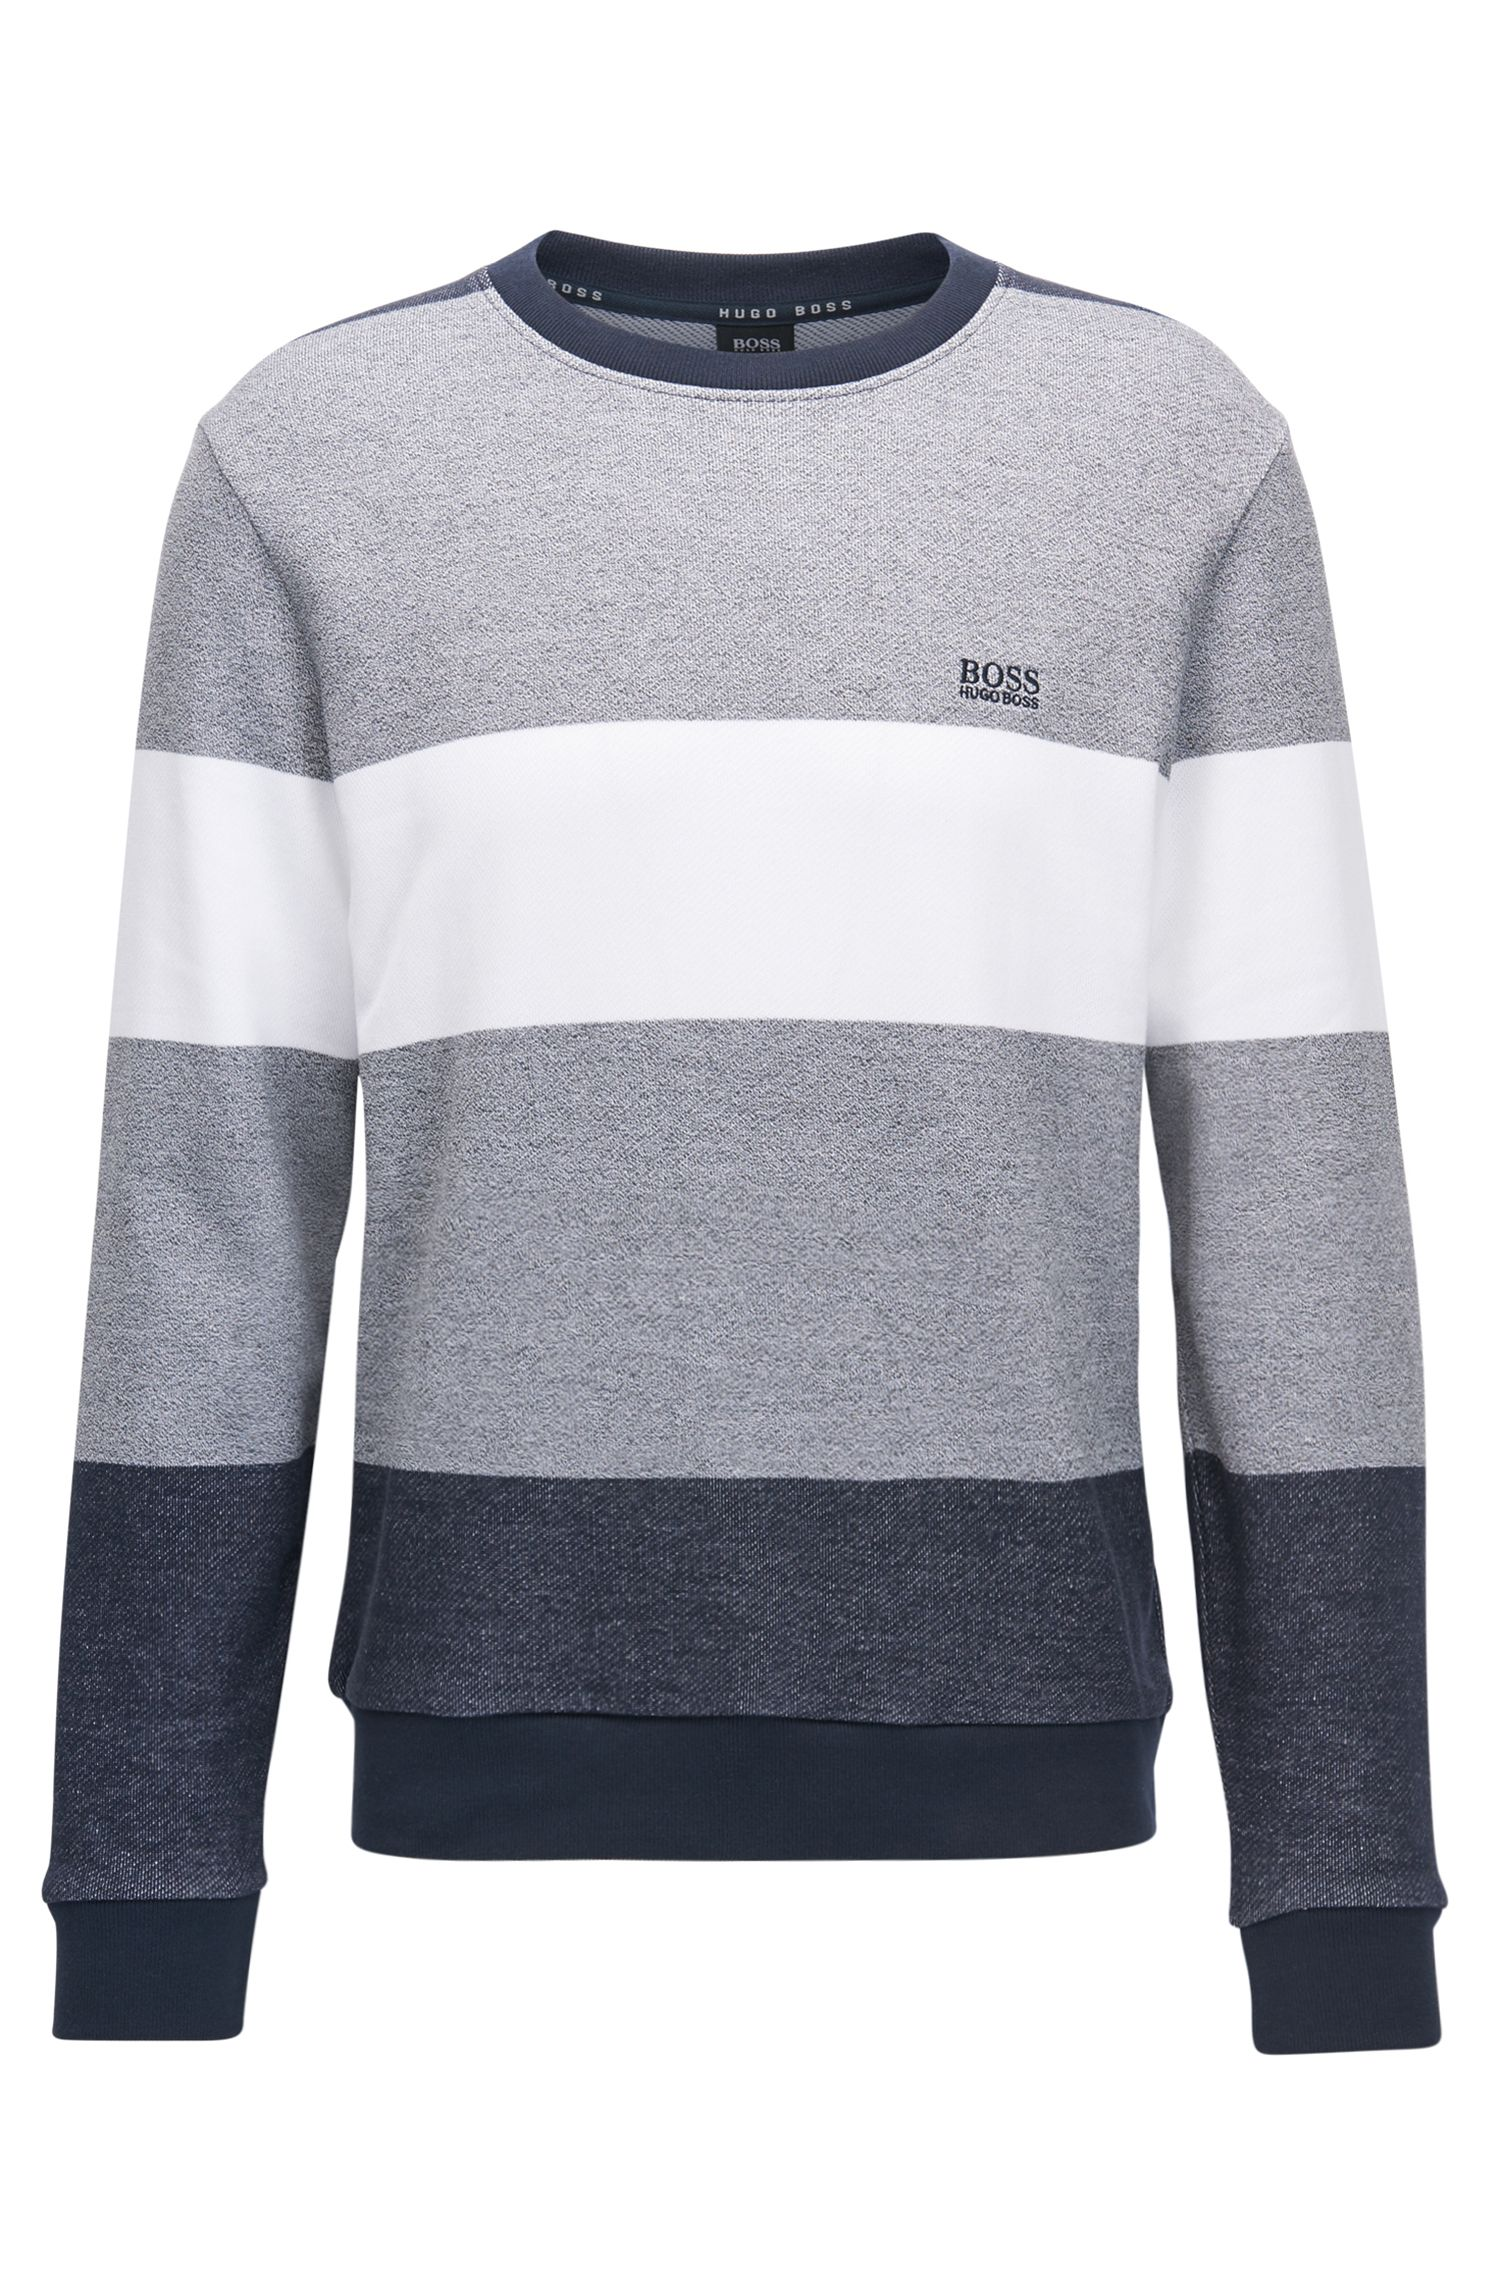 French Terry Colorblocked Cotton Sweatshirt | Nautical Sweatshirt, Grey